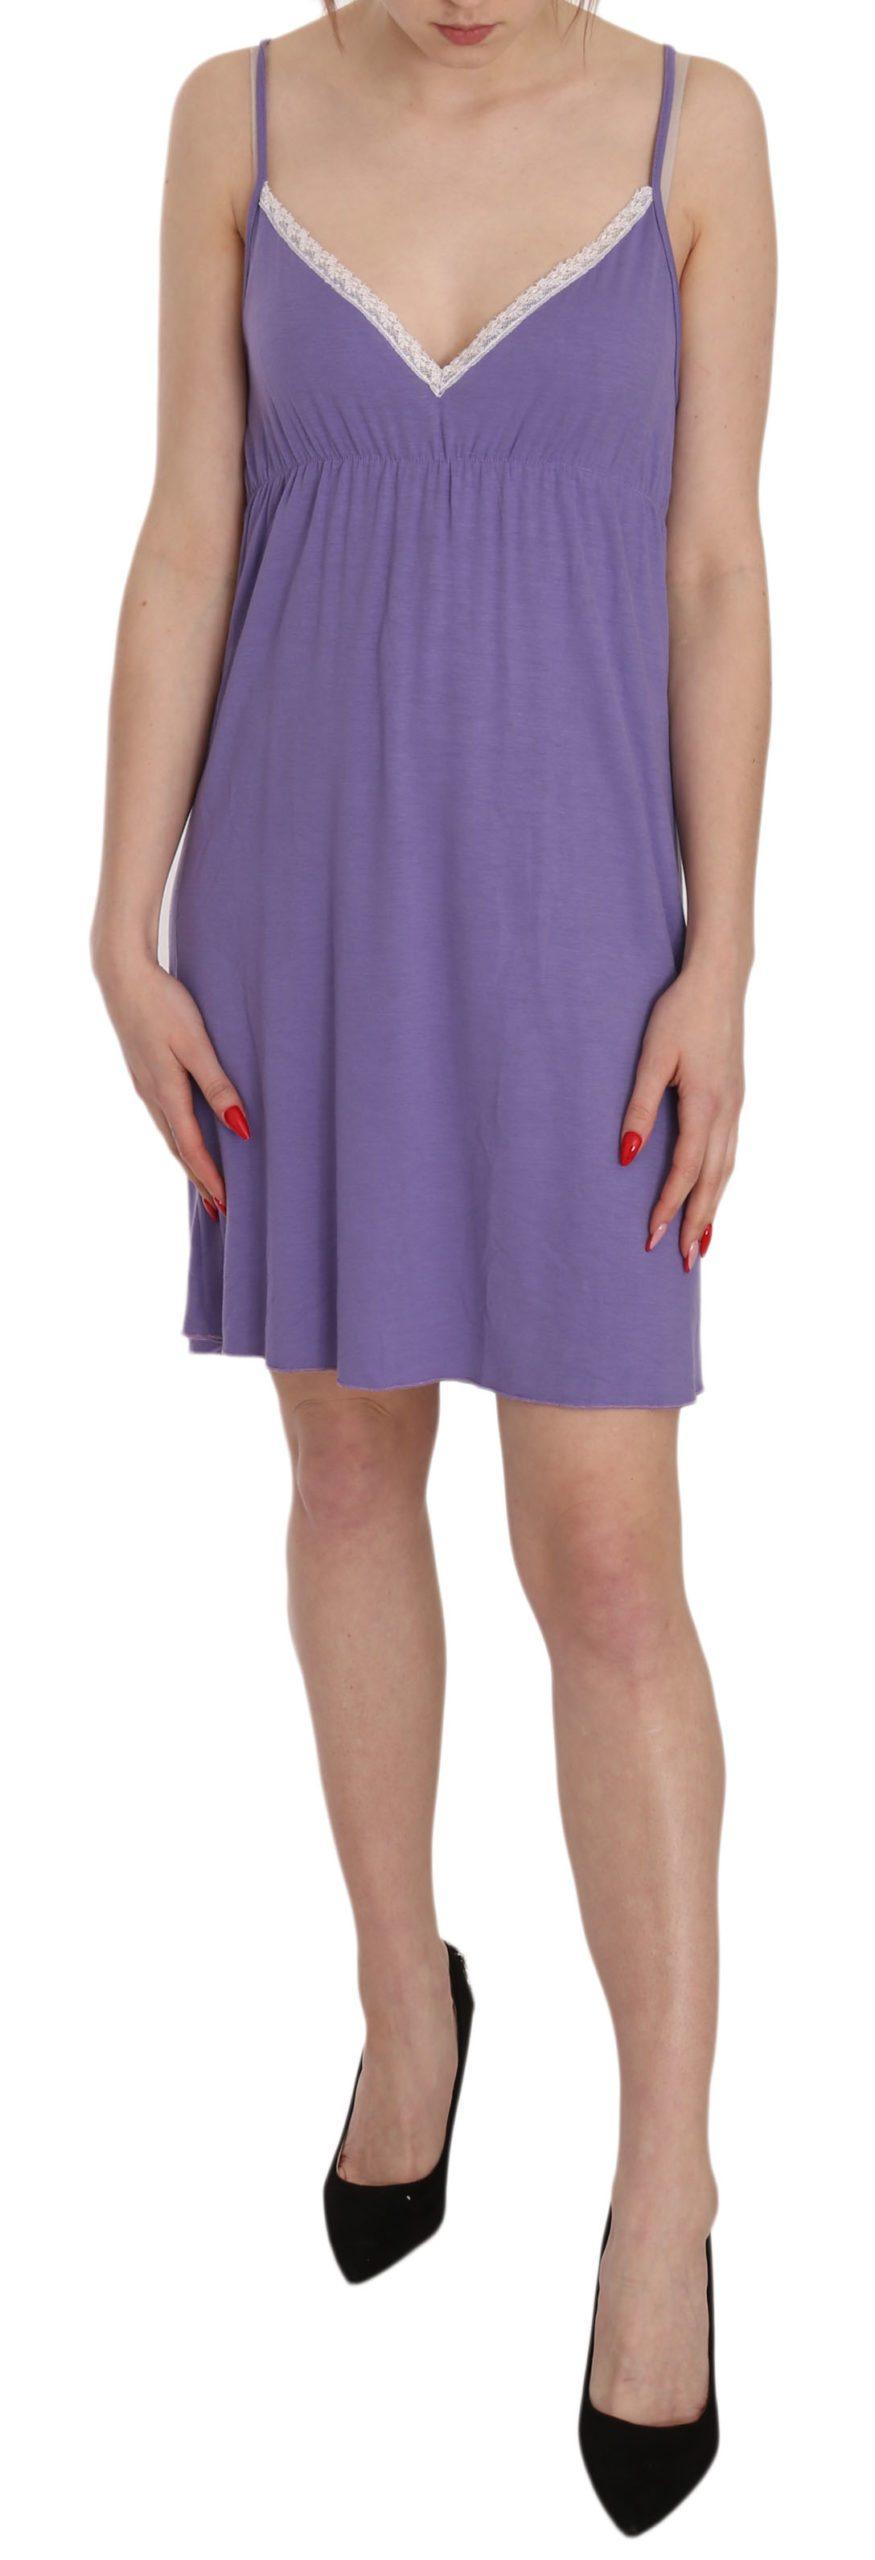 PINK MEMORIES Women's Spaghetti Strap Shift Mini Dress Purple TSH3440 - IT42 M